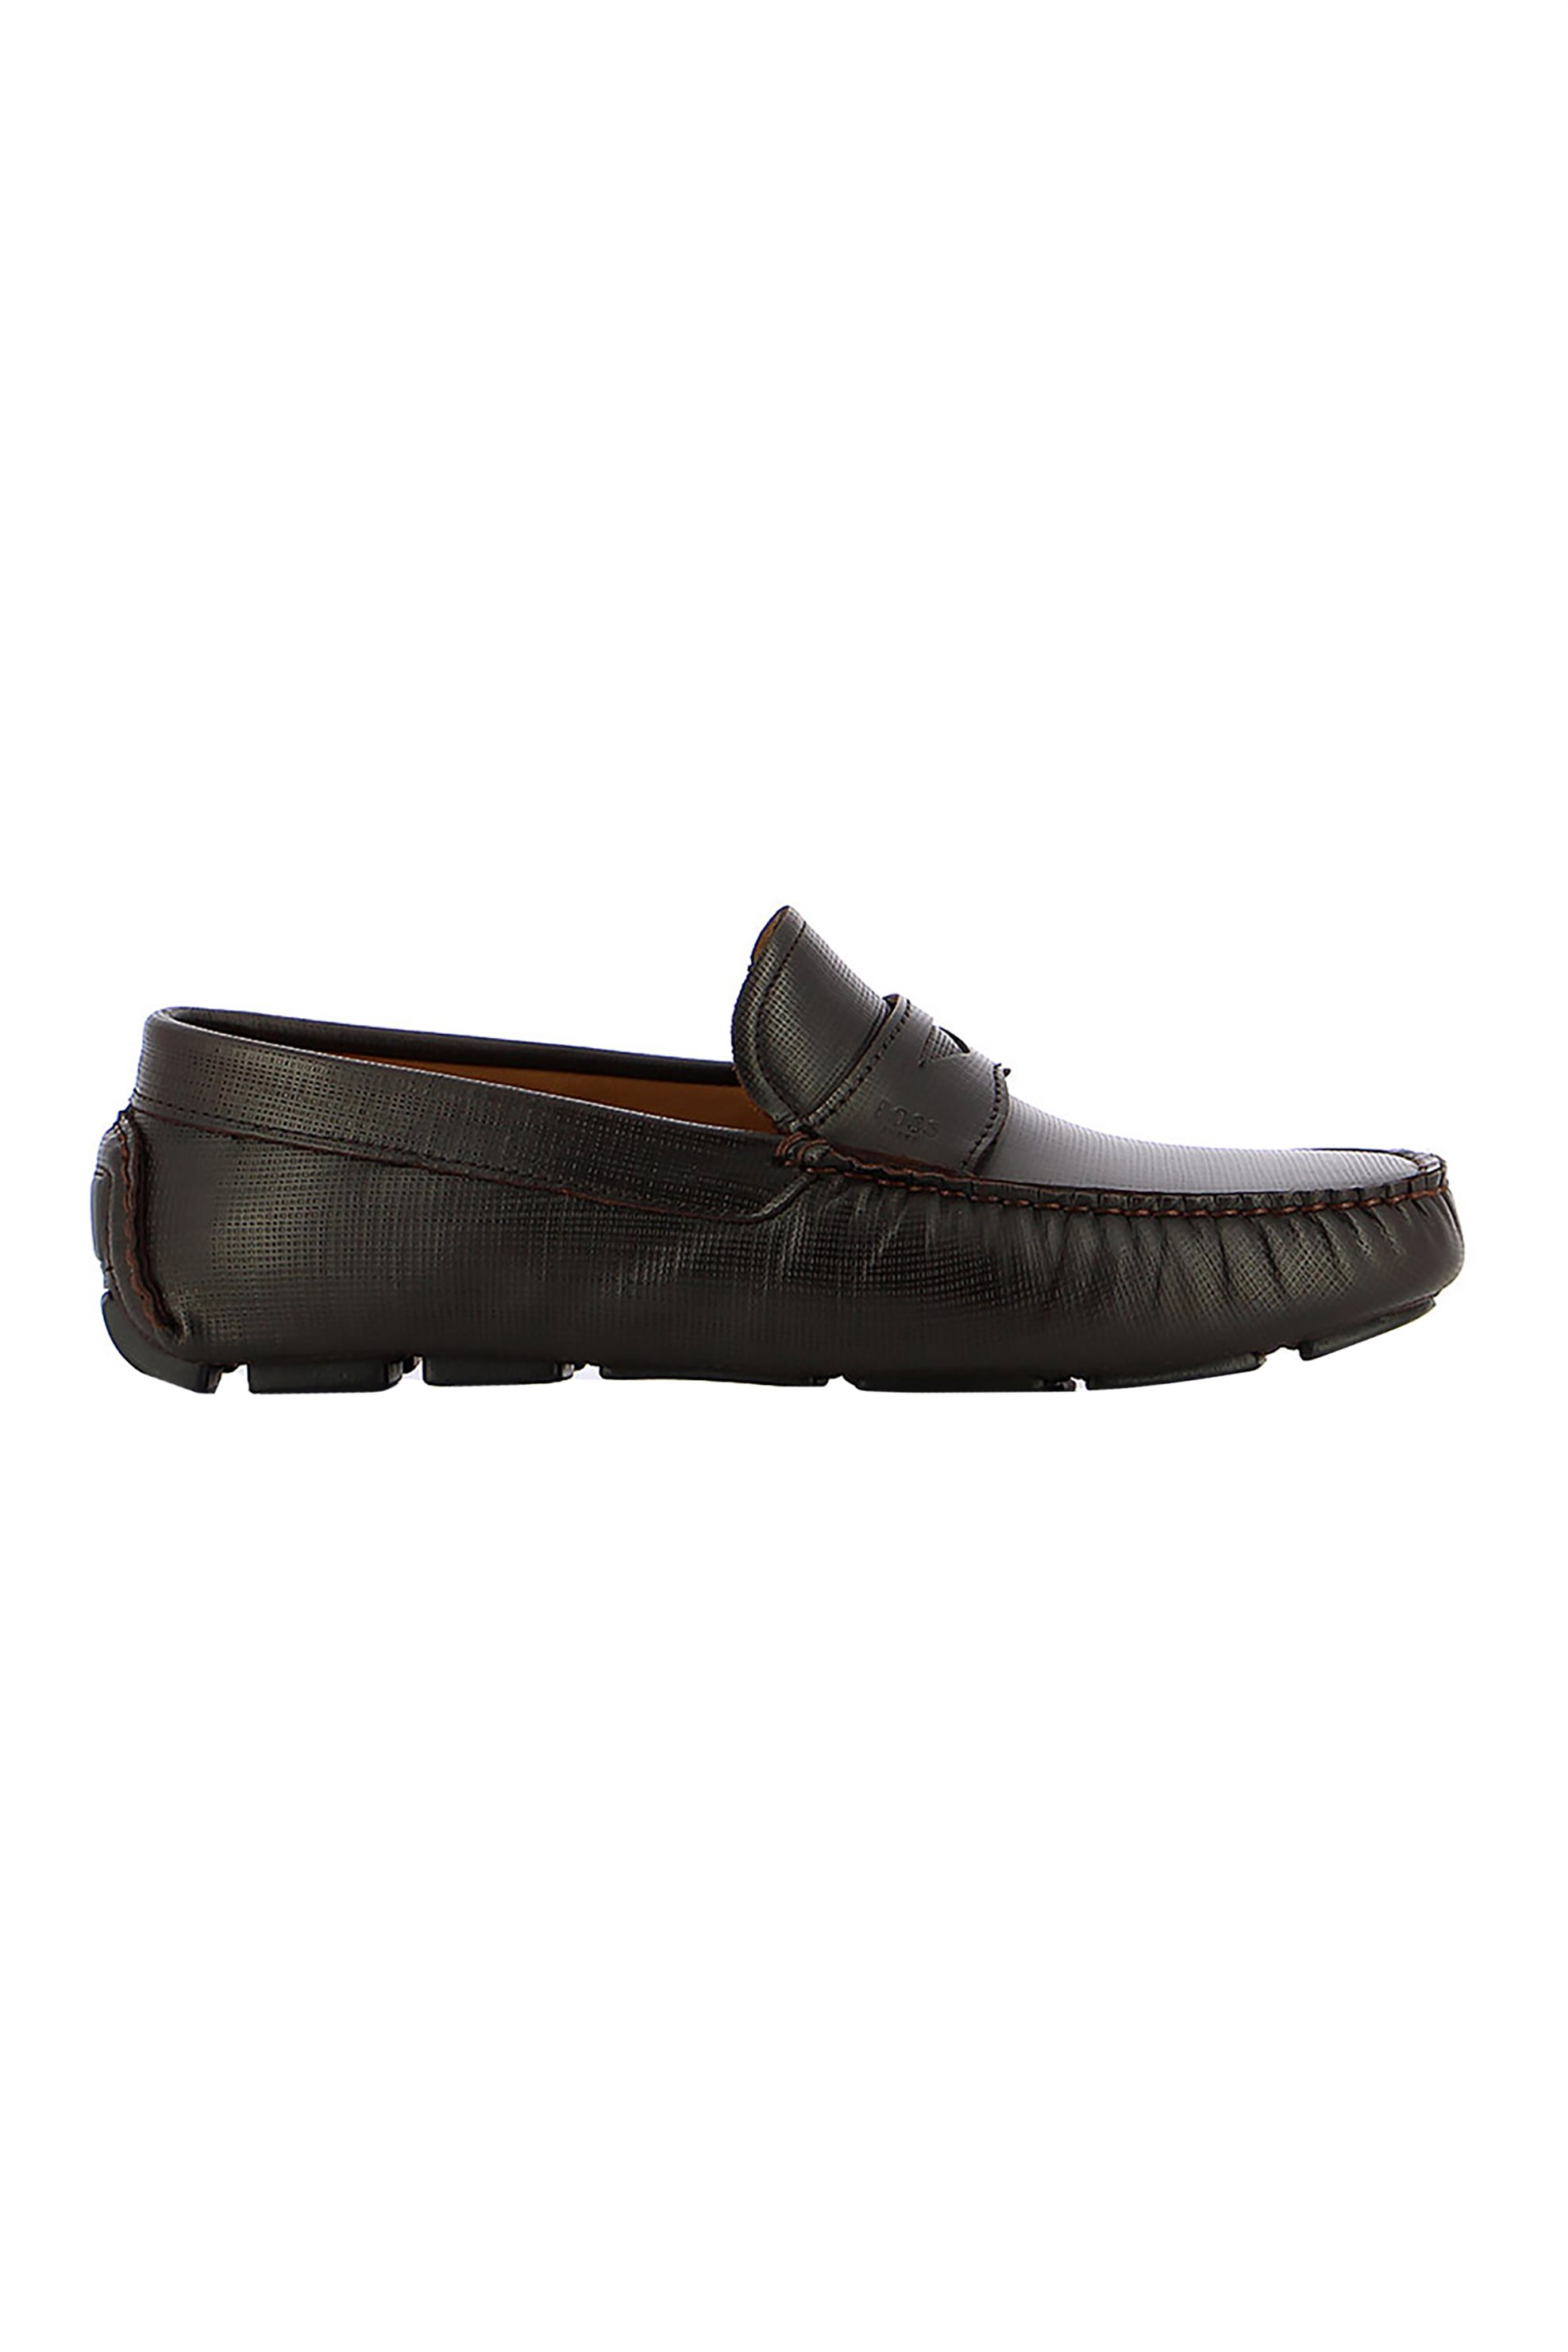 Boss Shoes ανδρικά δερμάτινα μοκασίνια με ανάγλυφο σχέδιο – Q5784 CHAVEZ – Μαύρο